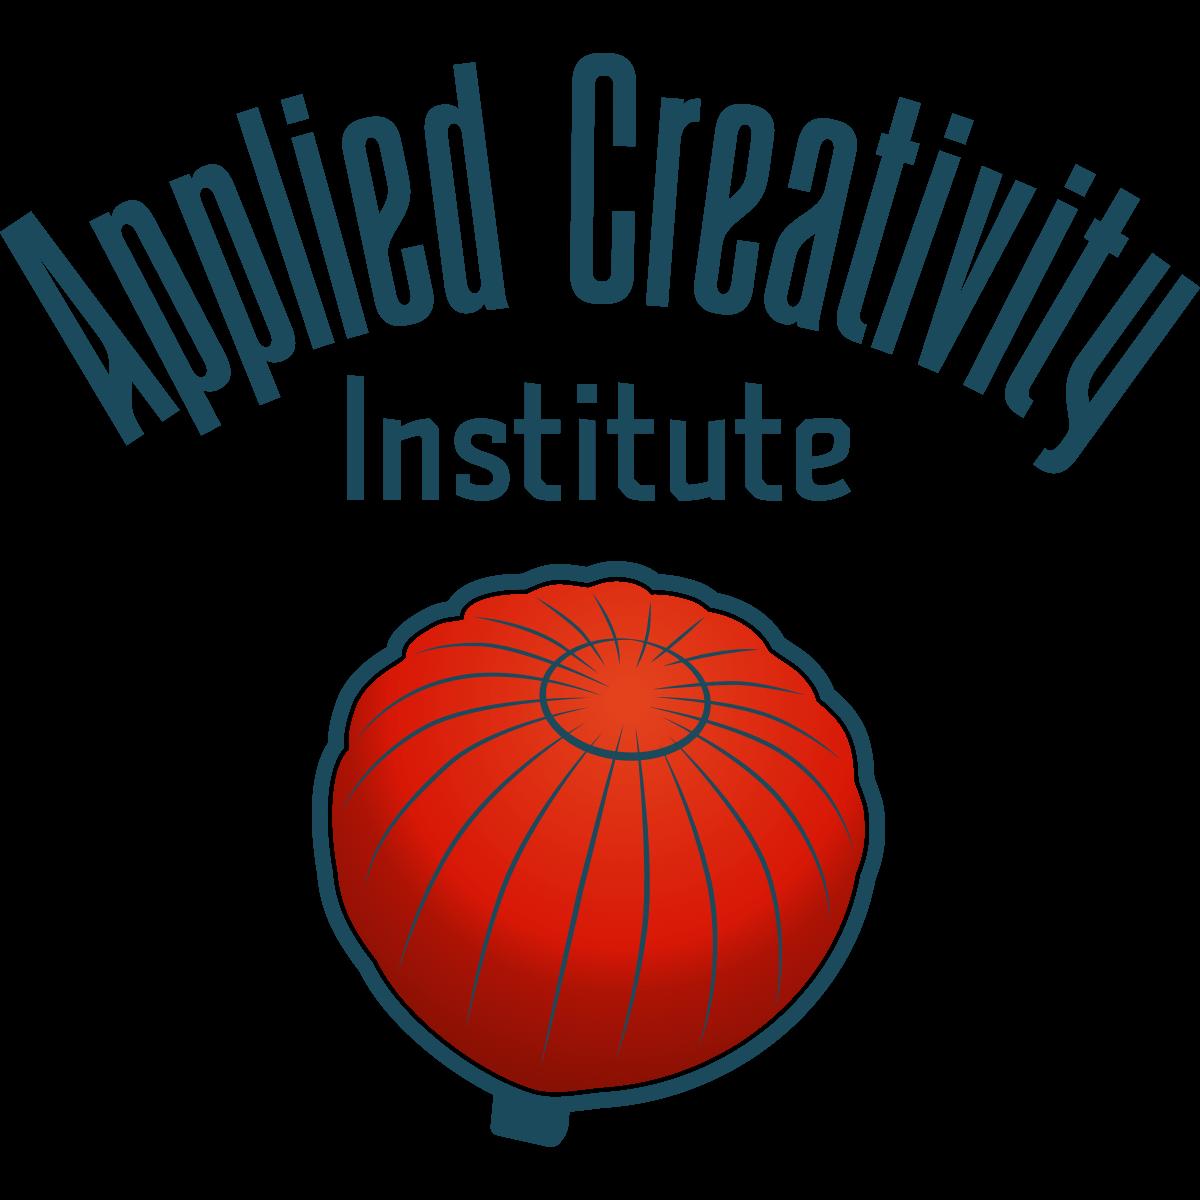 Applied Creativity Institute